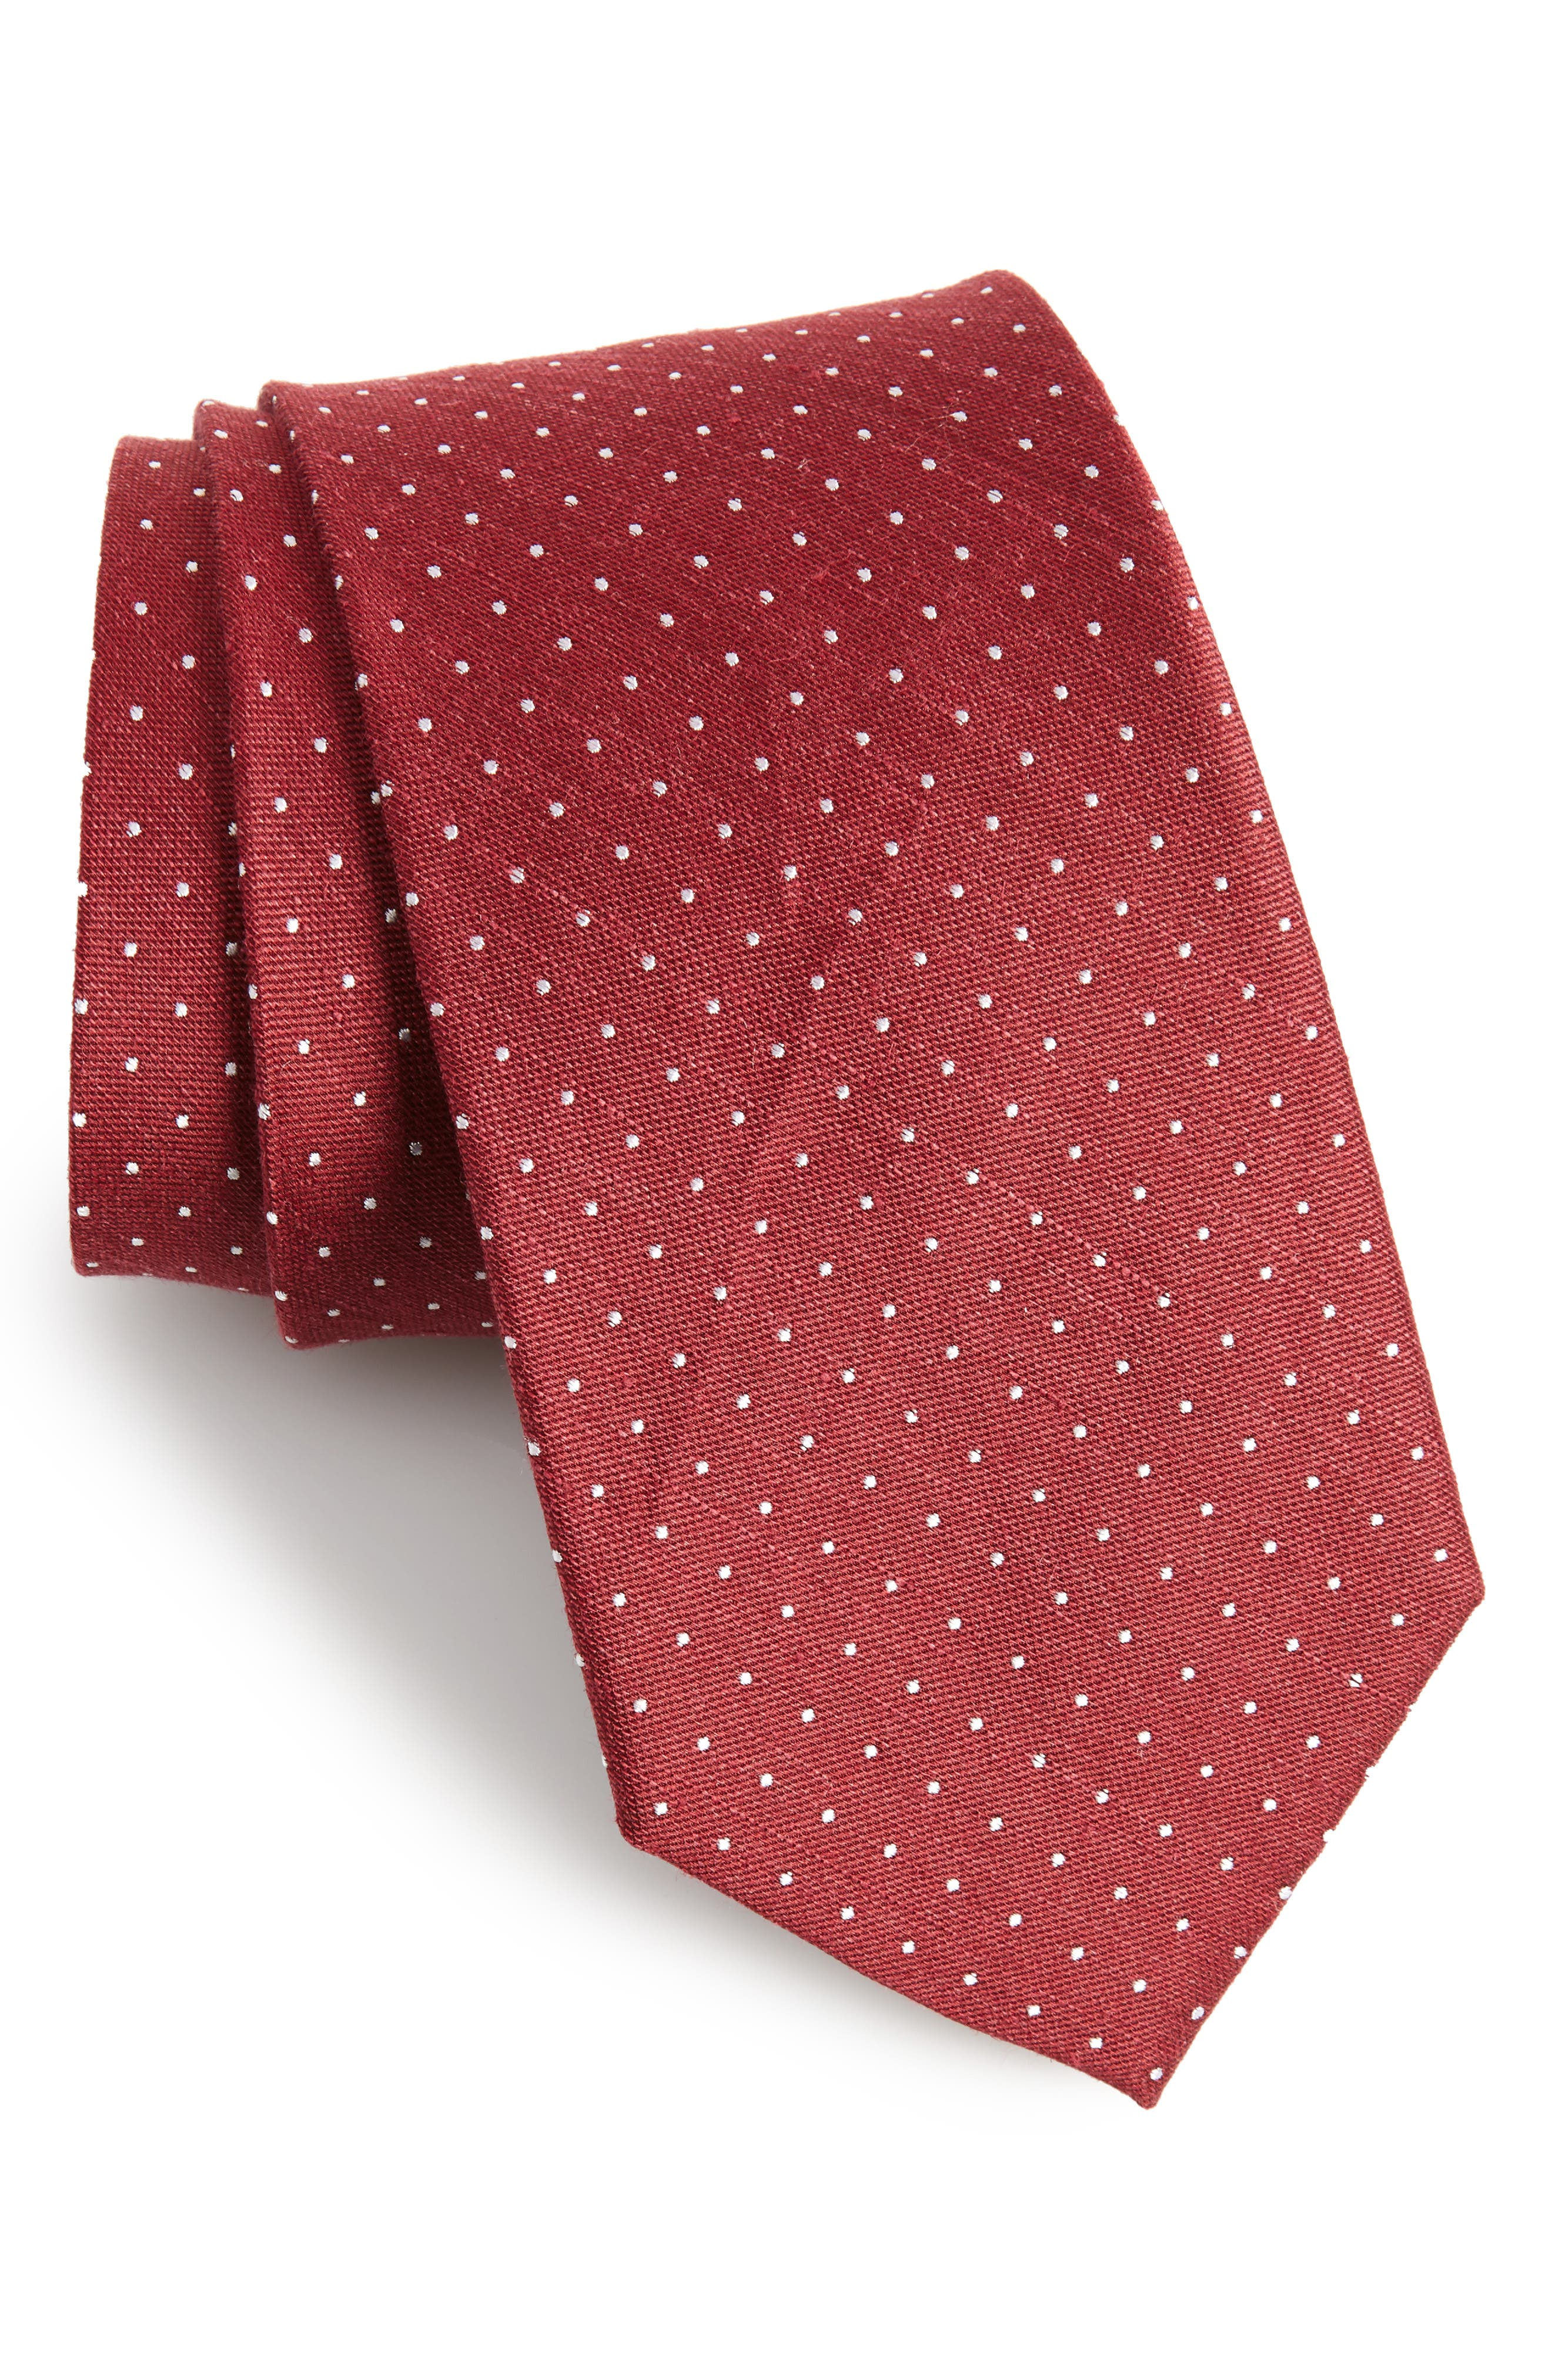 Main Image - The Tie Bar Dot Silk & Linen Tie (X-Long)